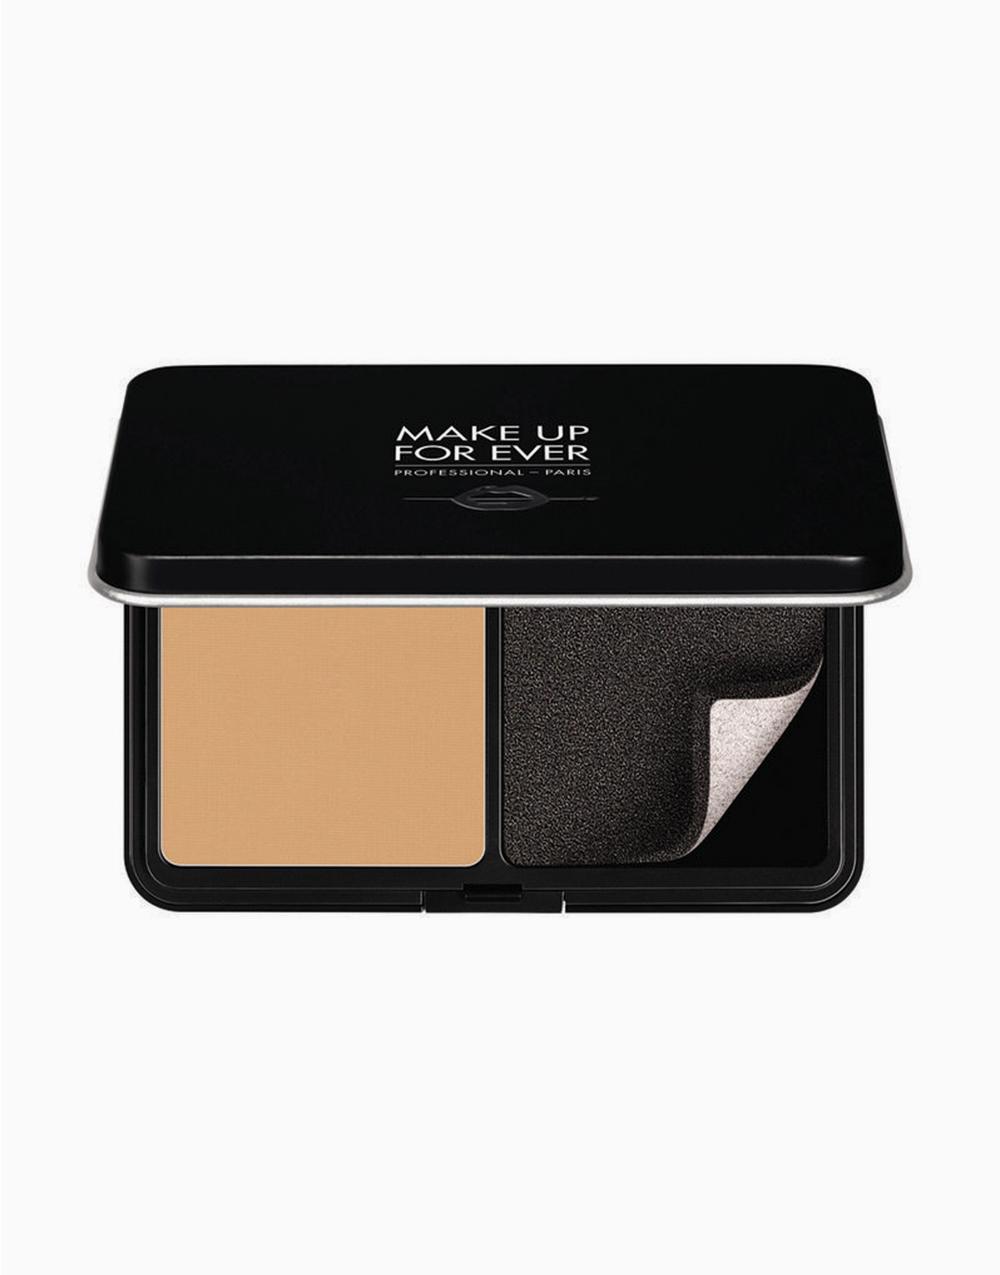 Matte Velvet Skin Compact (11g) by Make Up For Ever | Y315